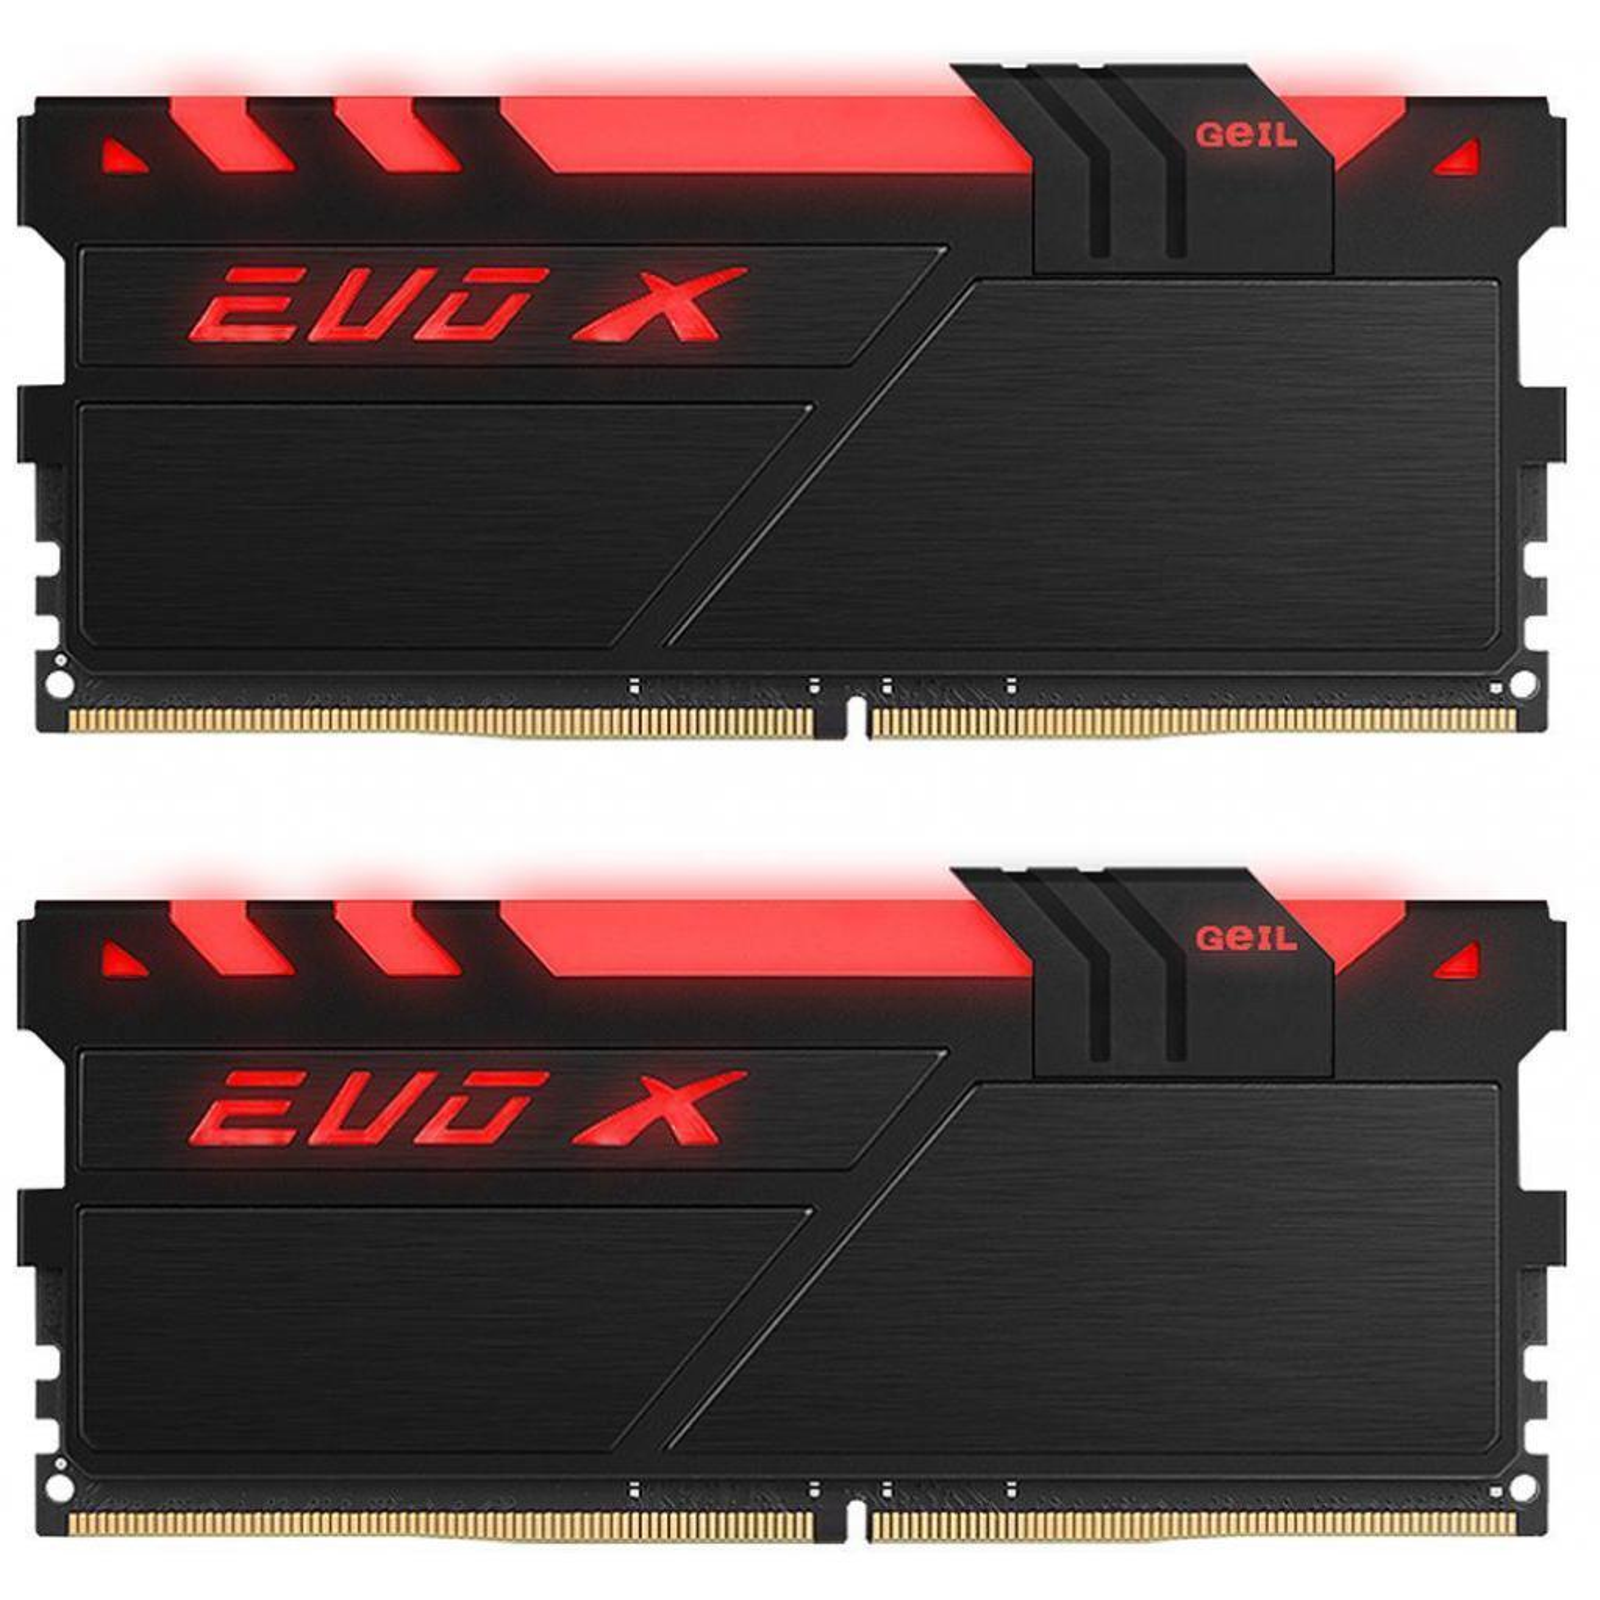 Модуль памяти для компьютера DDR4 16GB (2x8GB) 2400 MHz EVO X Black RGB LED Geil (GEXB416GB2400C16DC)